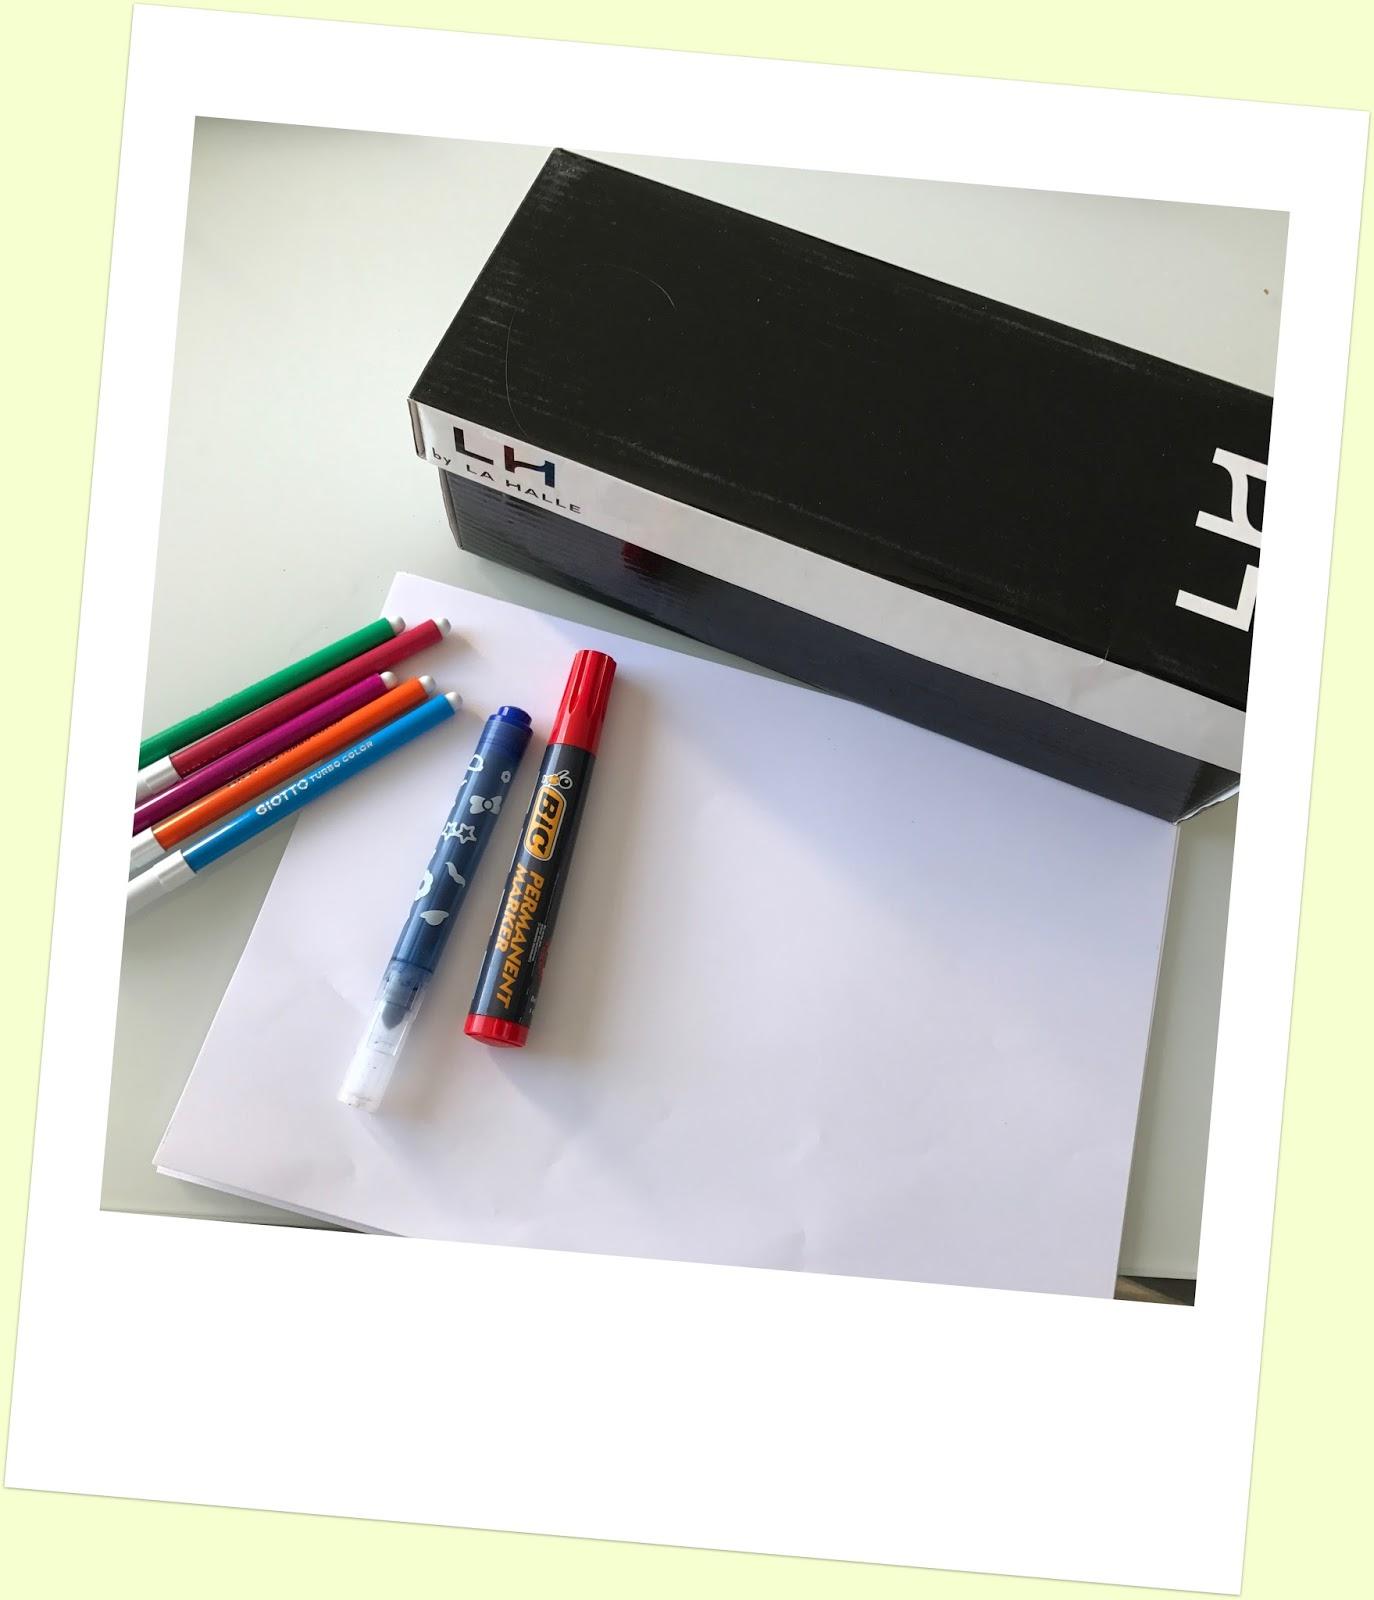 mon joli petit bureau les lections expliqu es aux petits. Black Bedroom Furniture Sets. Home Design Ideas